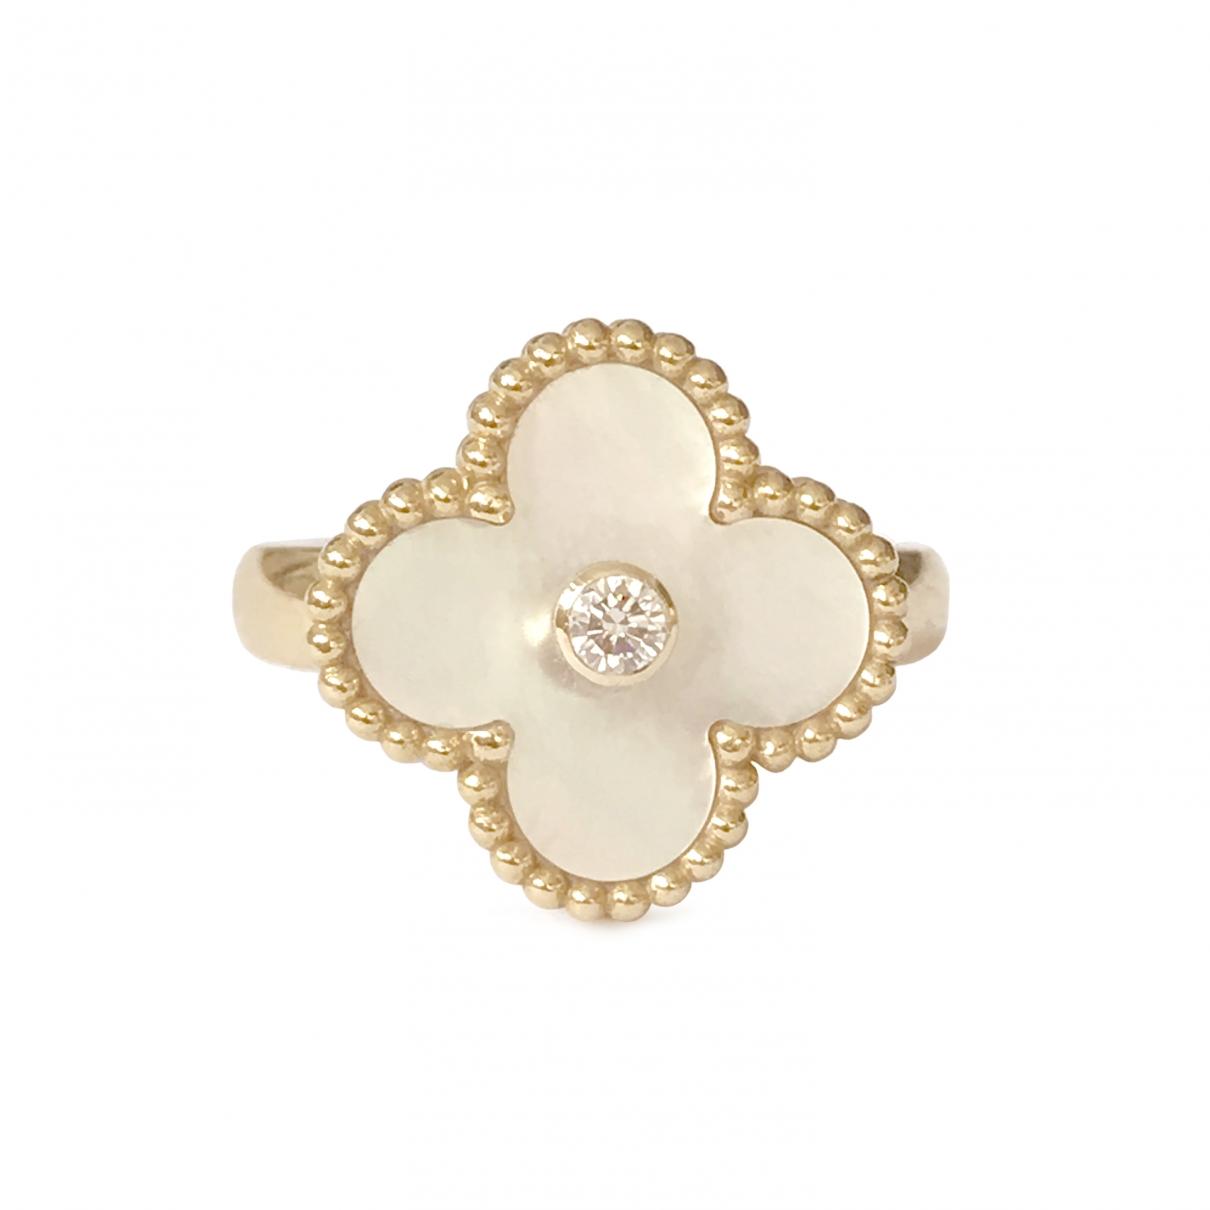 Van Cleef & Arpels Vintage Alhambra Ring in  Weiss Gelbgold